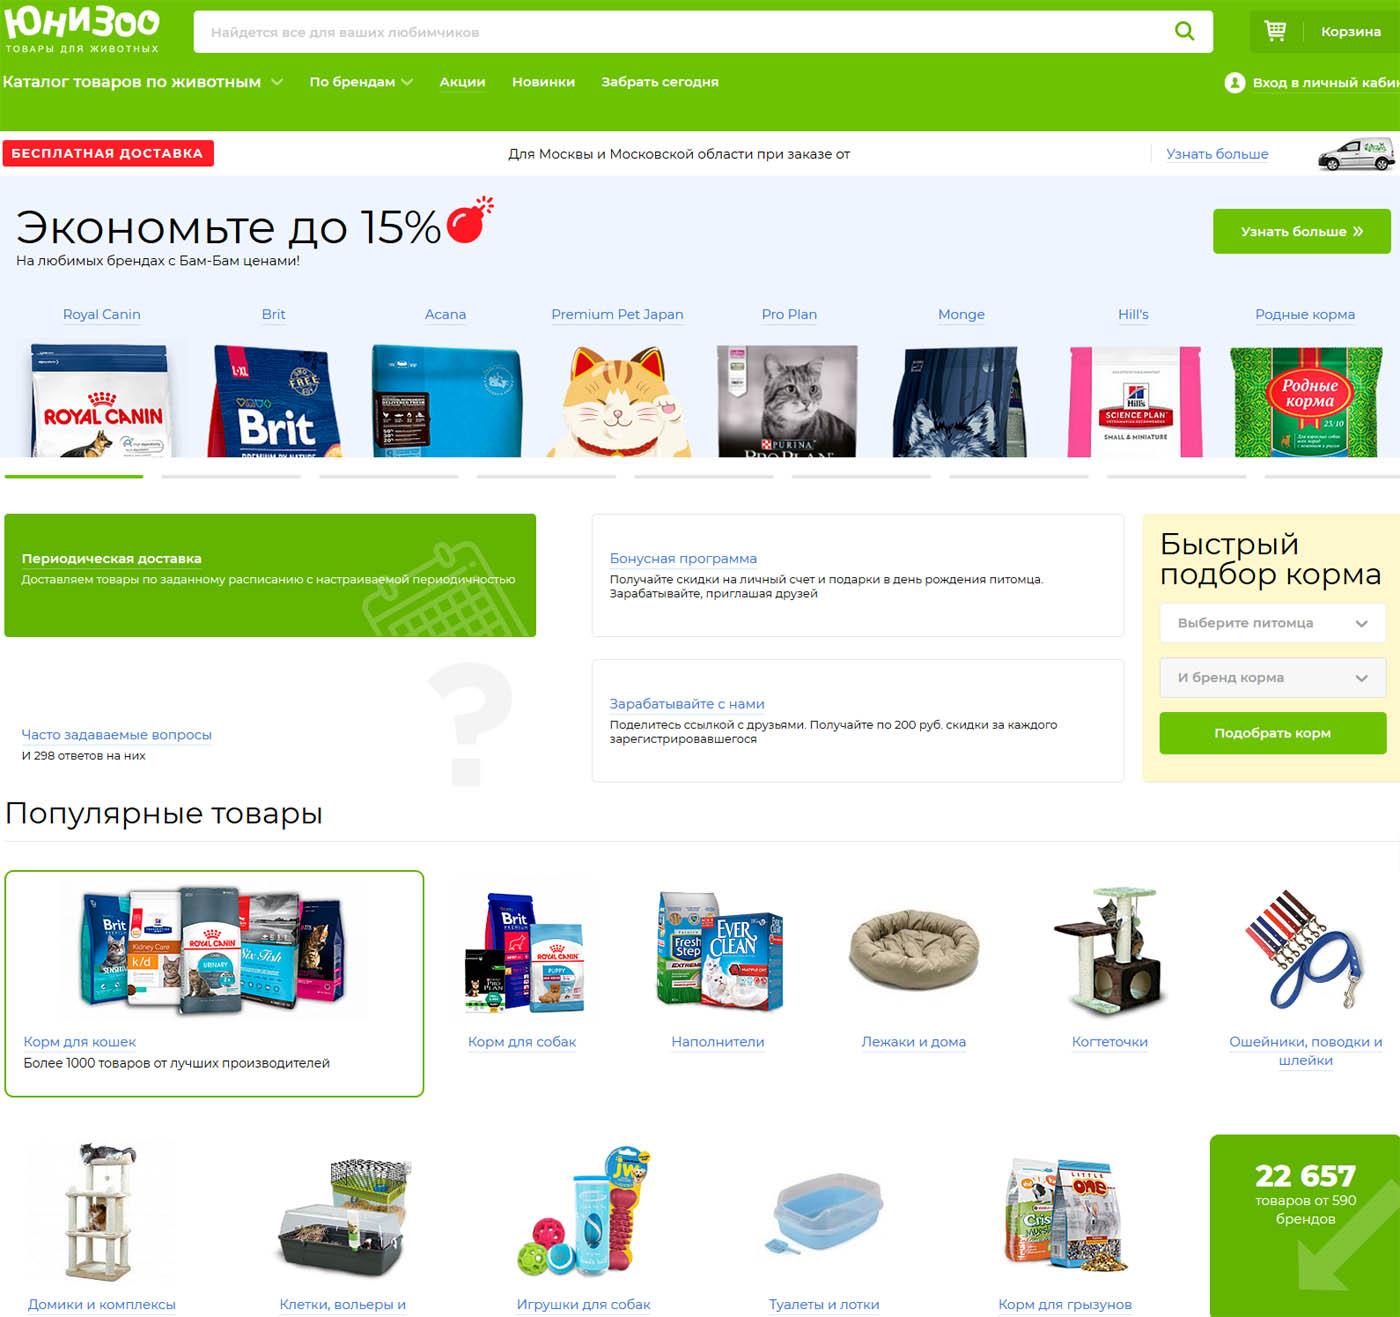 Интернет-магазин Юнизоо